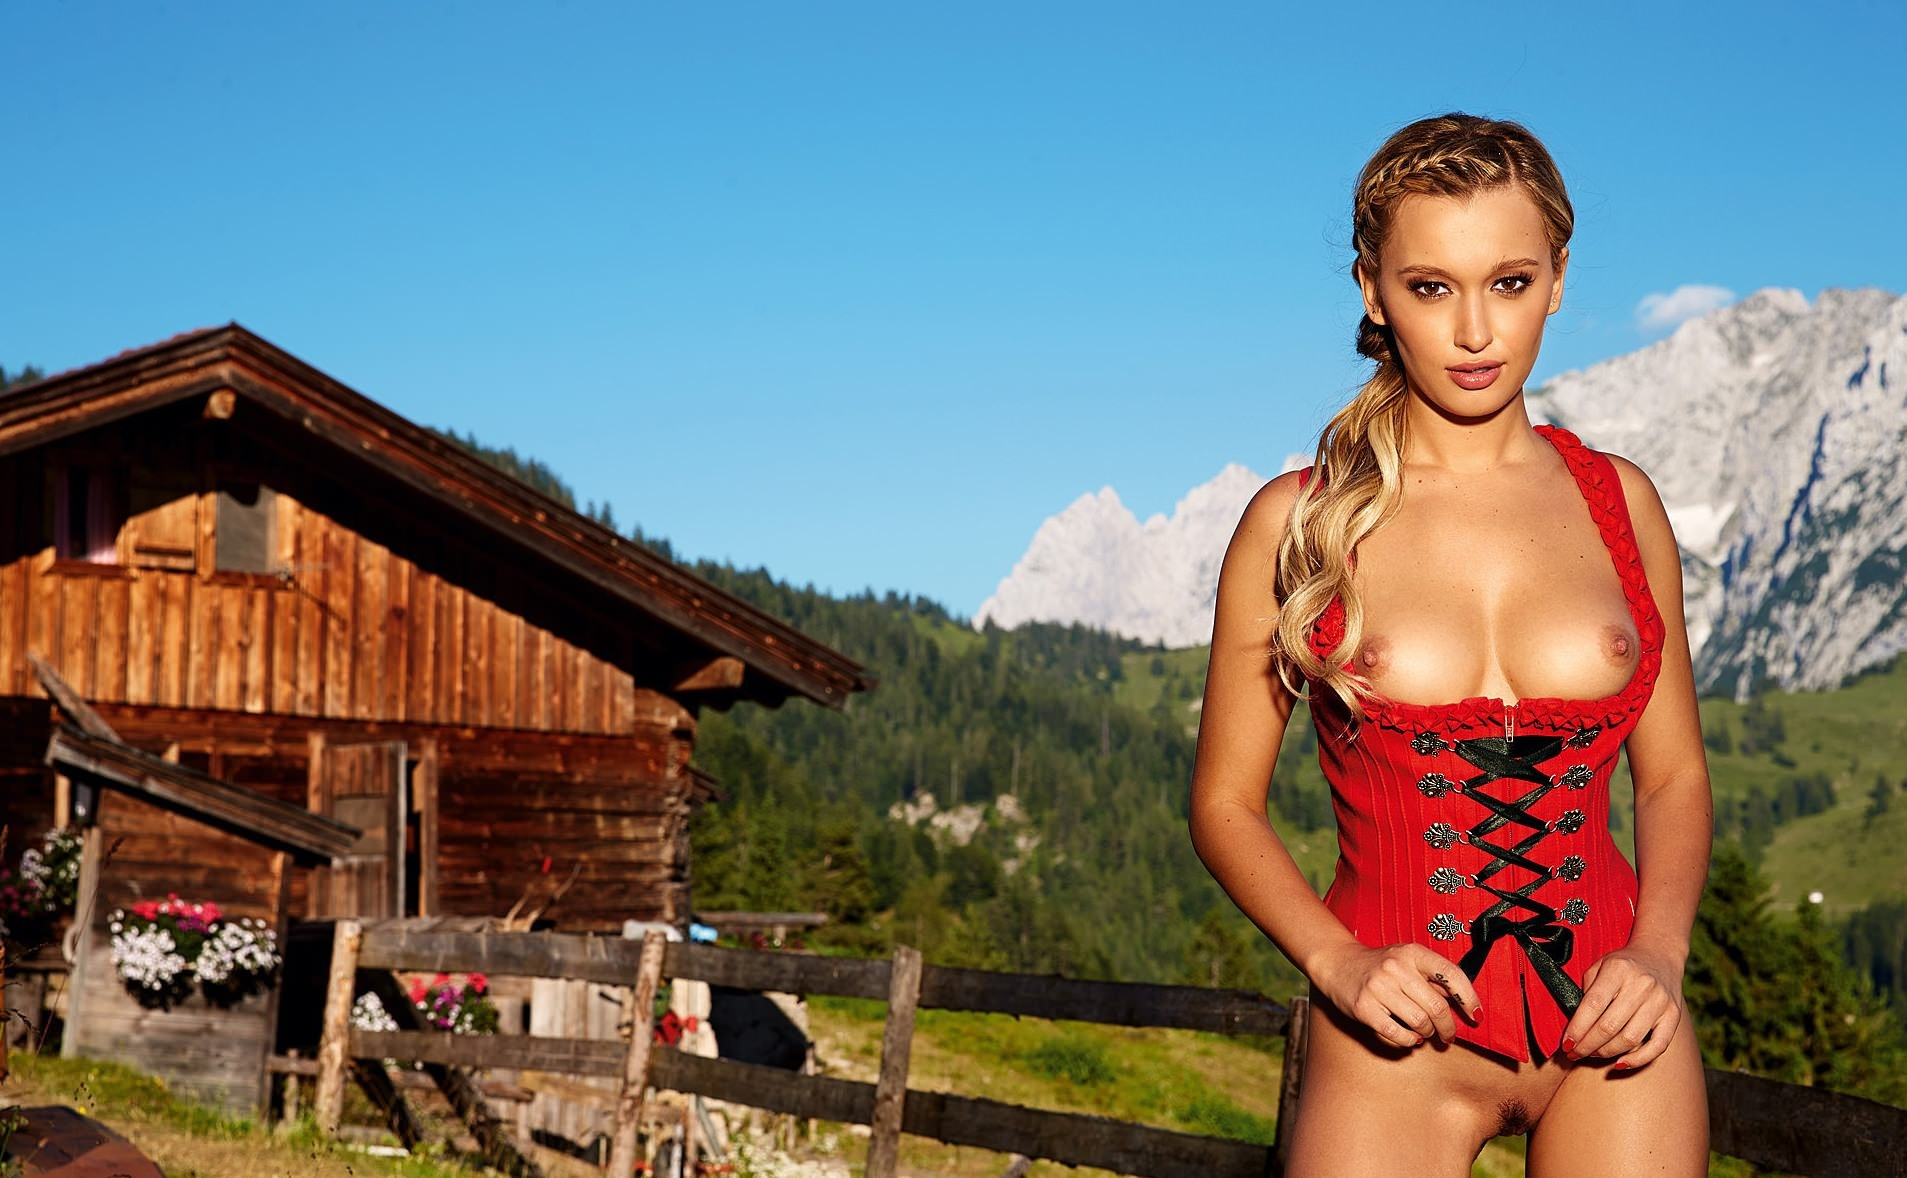 Amazon Hot Selling German Market Tilting Outdoor Beach Umbrella